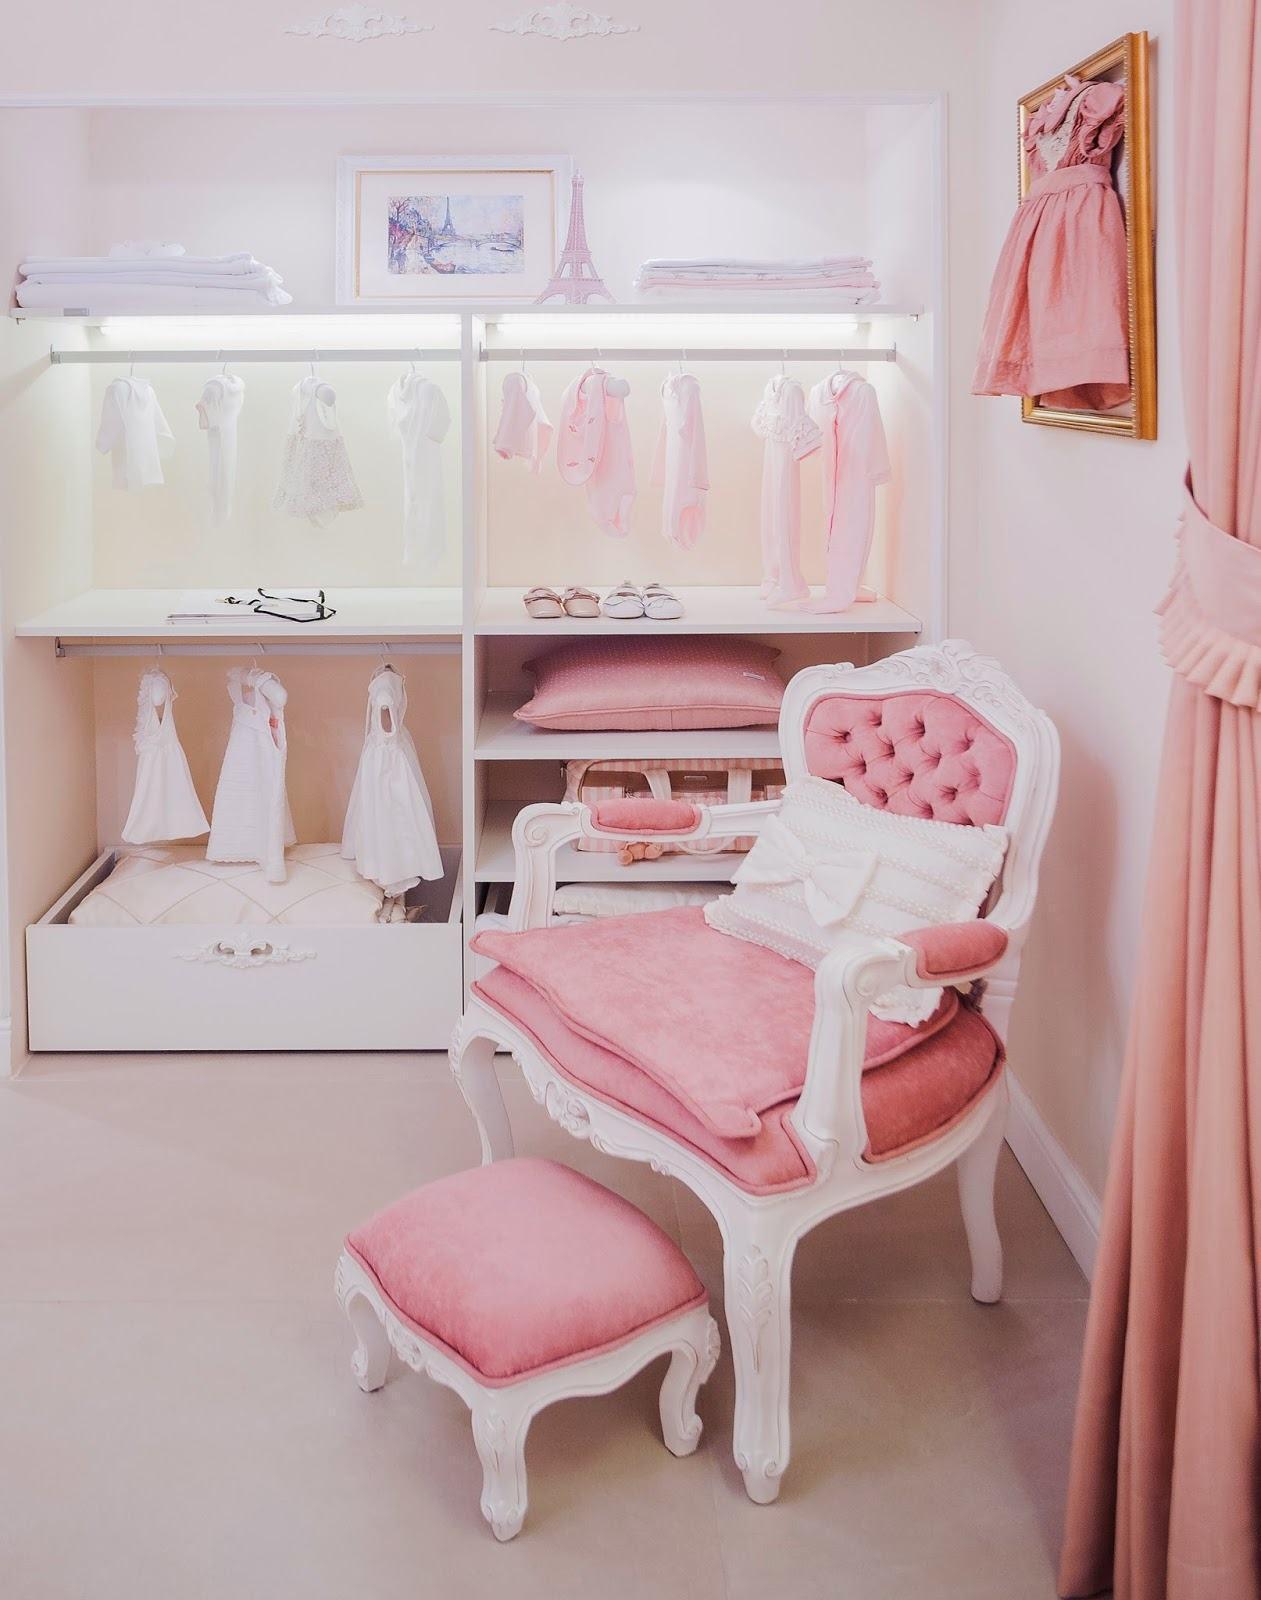 Quarto De Bebe Rosa A Id Ia De Beleza Dom Stica ~ Papel De Parede Para Quarto De Bebe Rosa E Marrom